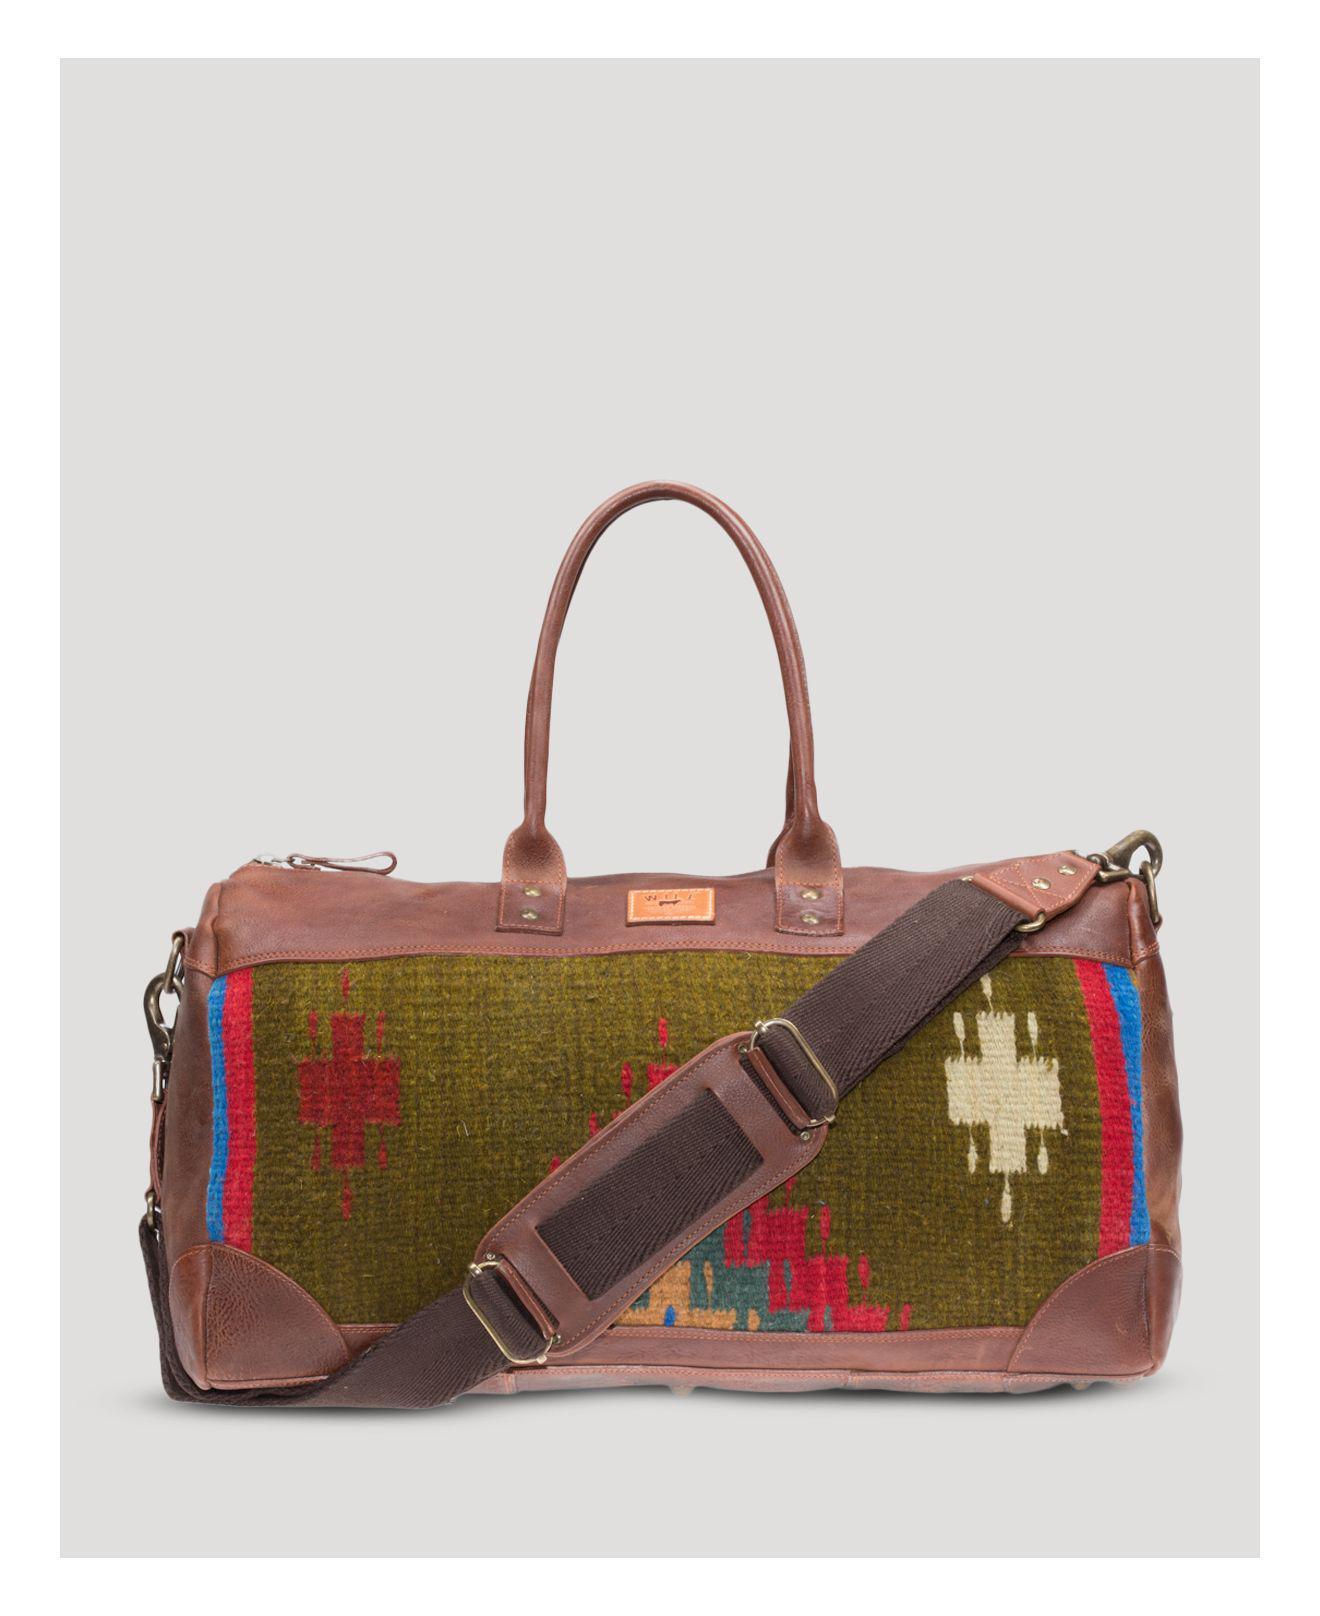 Lyst - Will Leather Goods Oaxacan Duffel in Brown for Men 402cf18b47